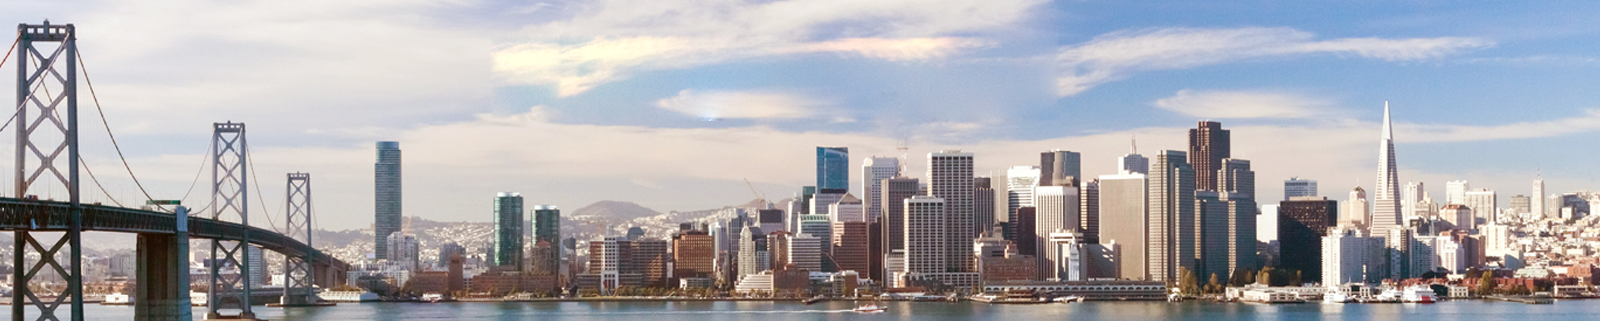 Silicon Valley City Guide